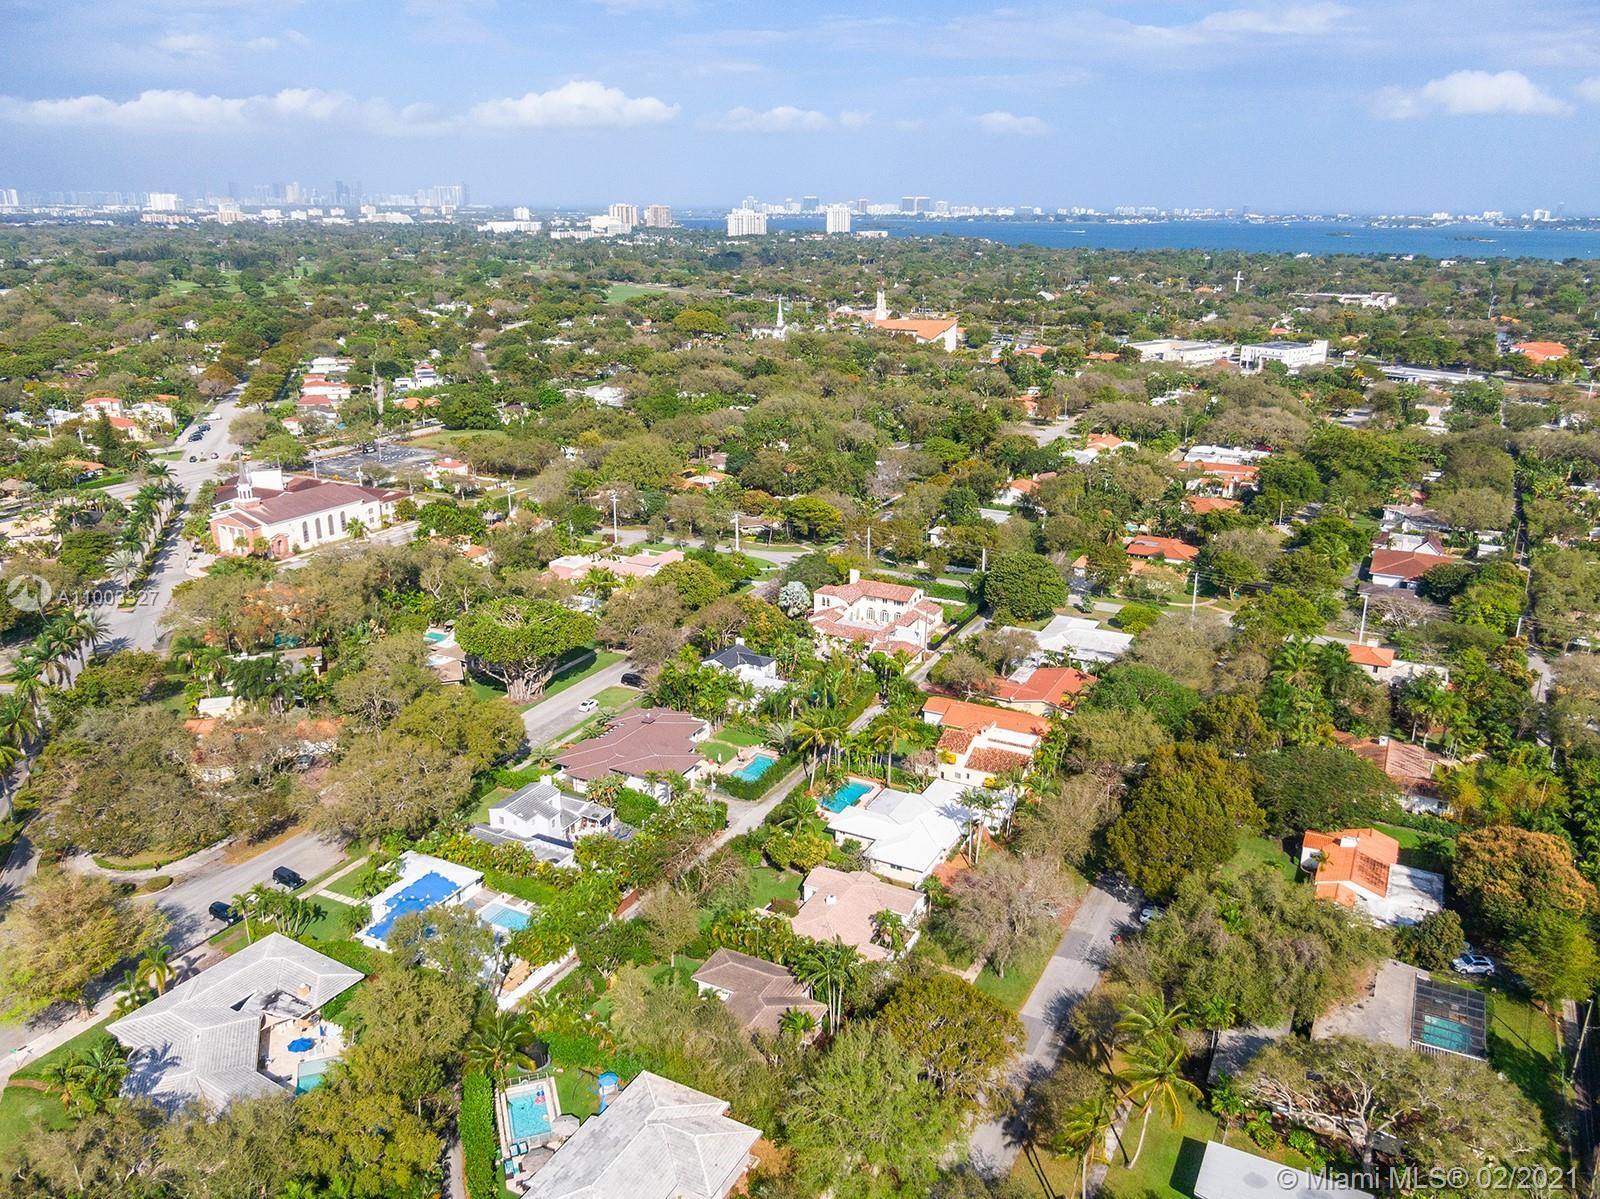 Miami Shores # - 35 - photo